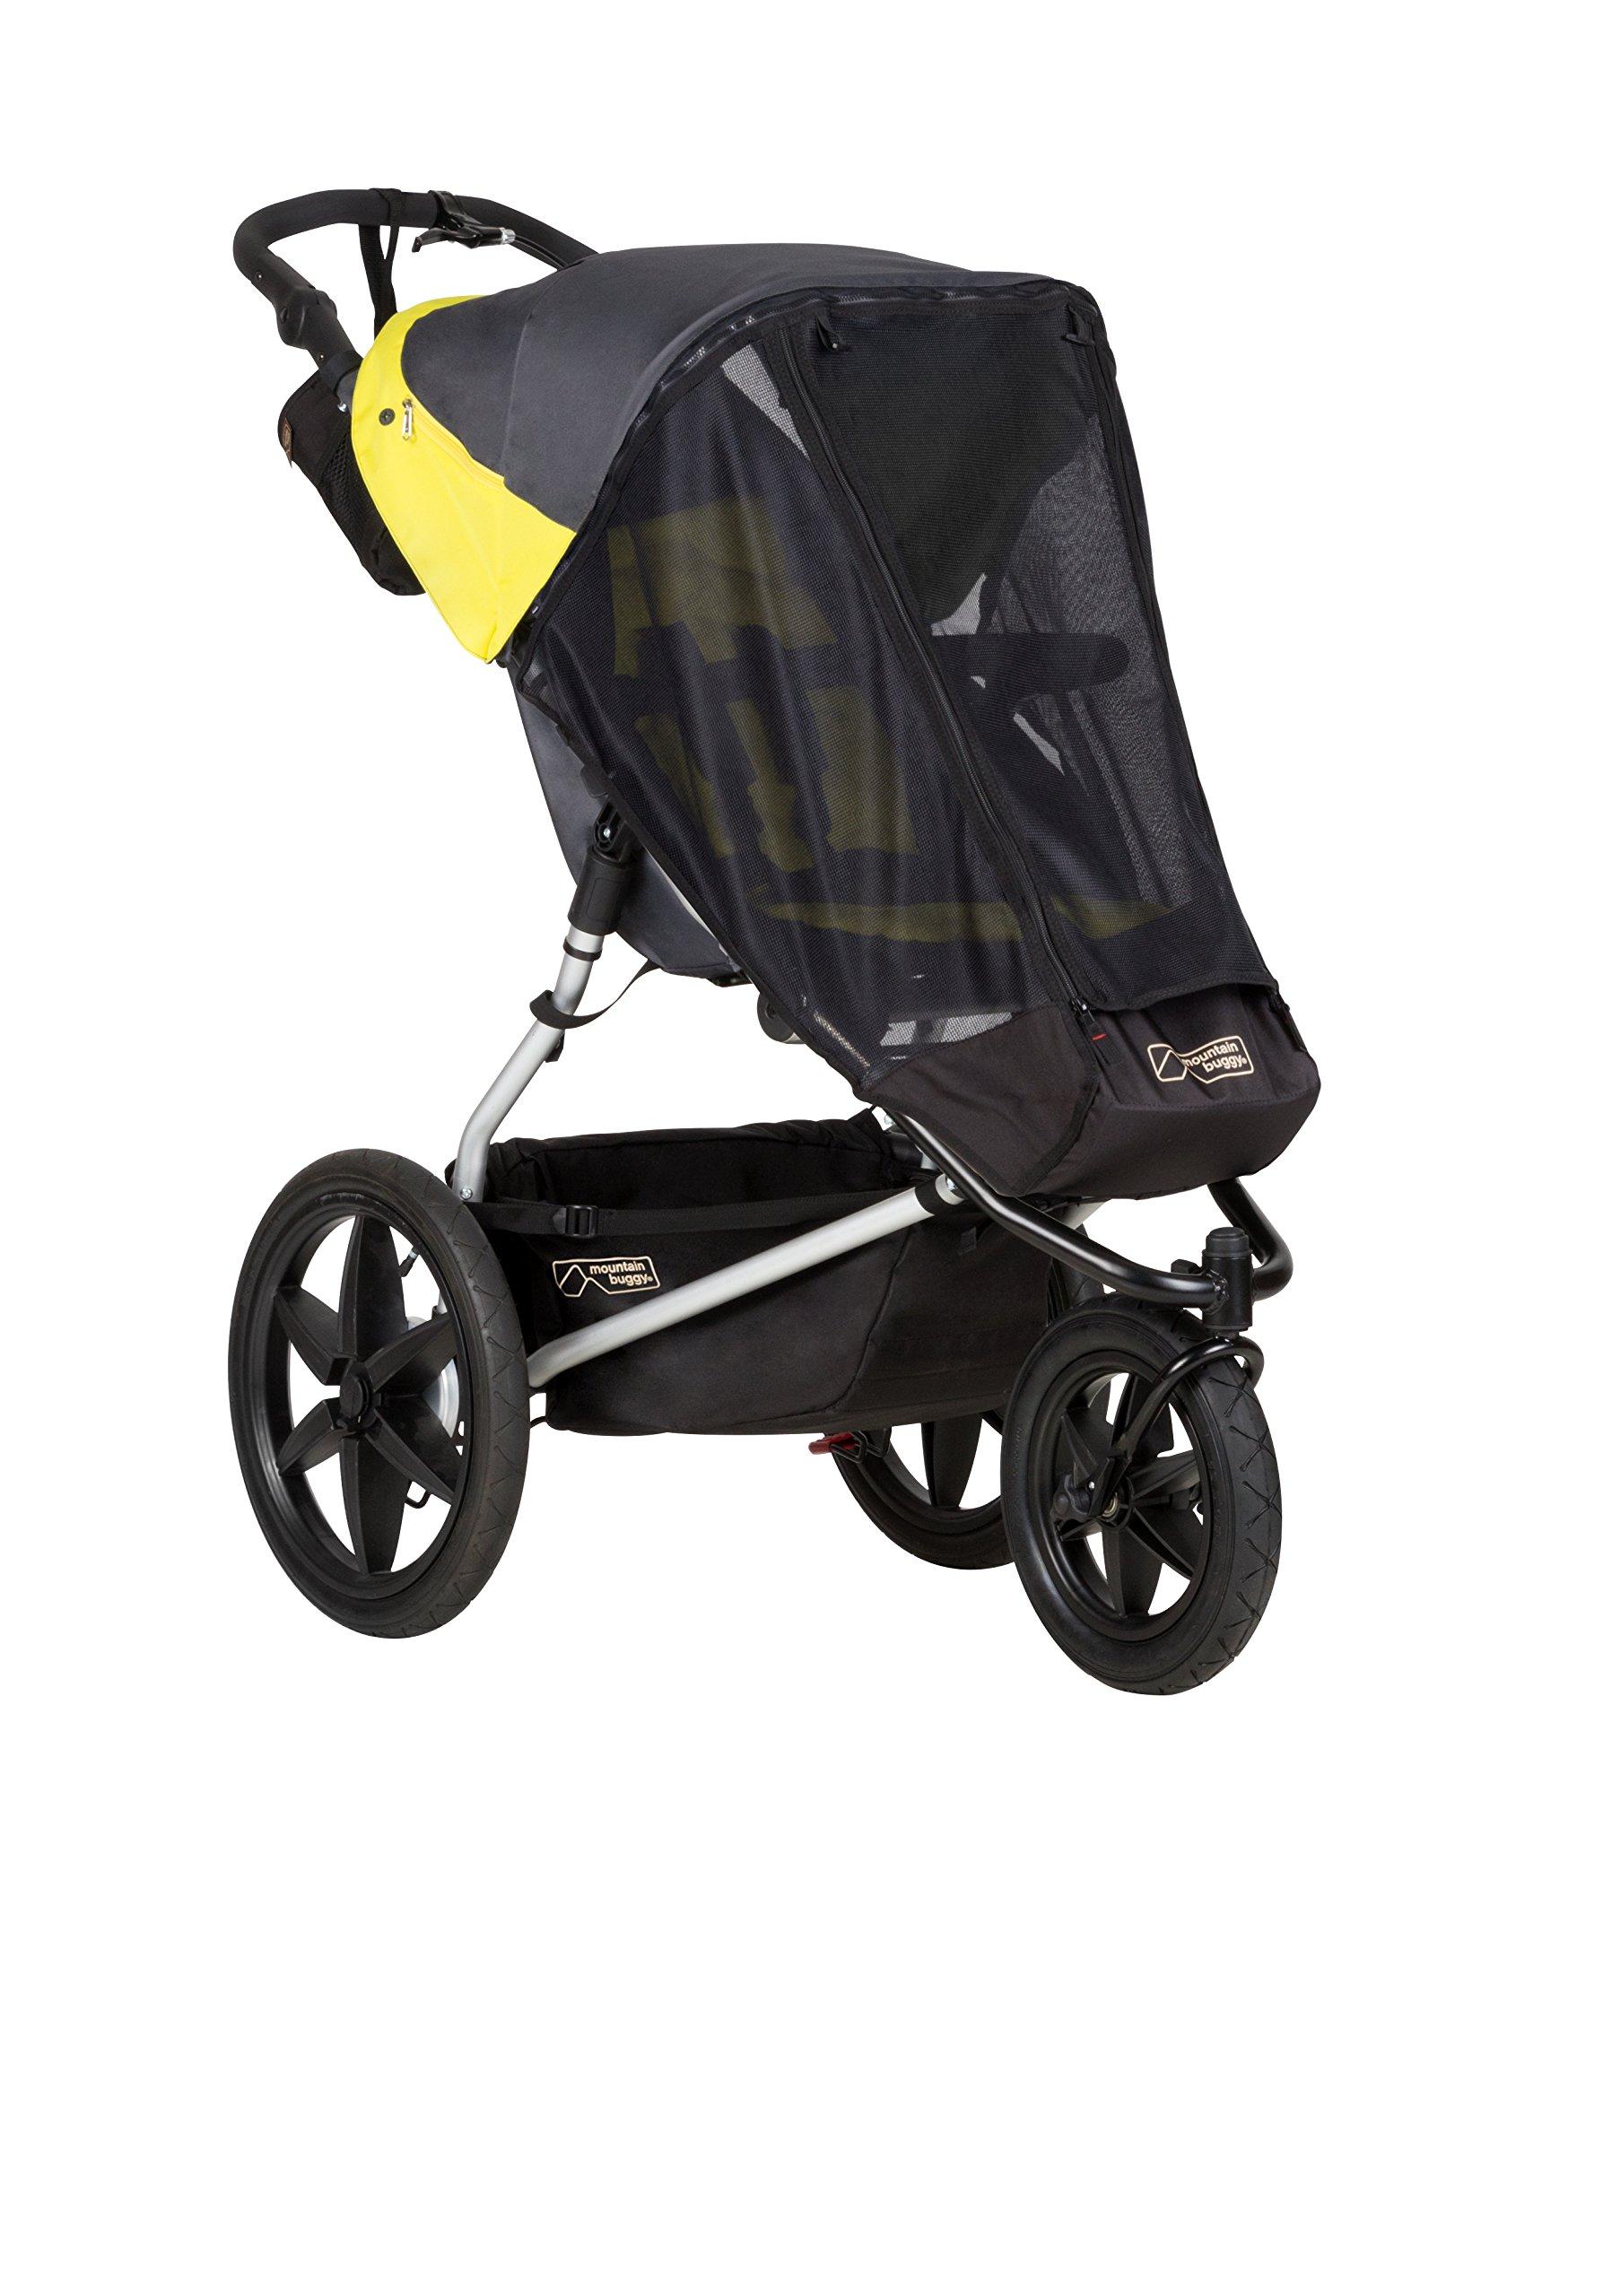 Mountain Buggy Terrain Premium Jogging Stroller, Graphite by Mountain Buggy (Image #12)